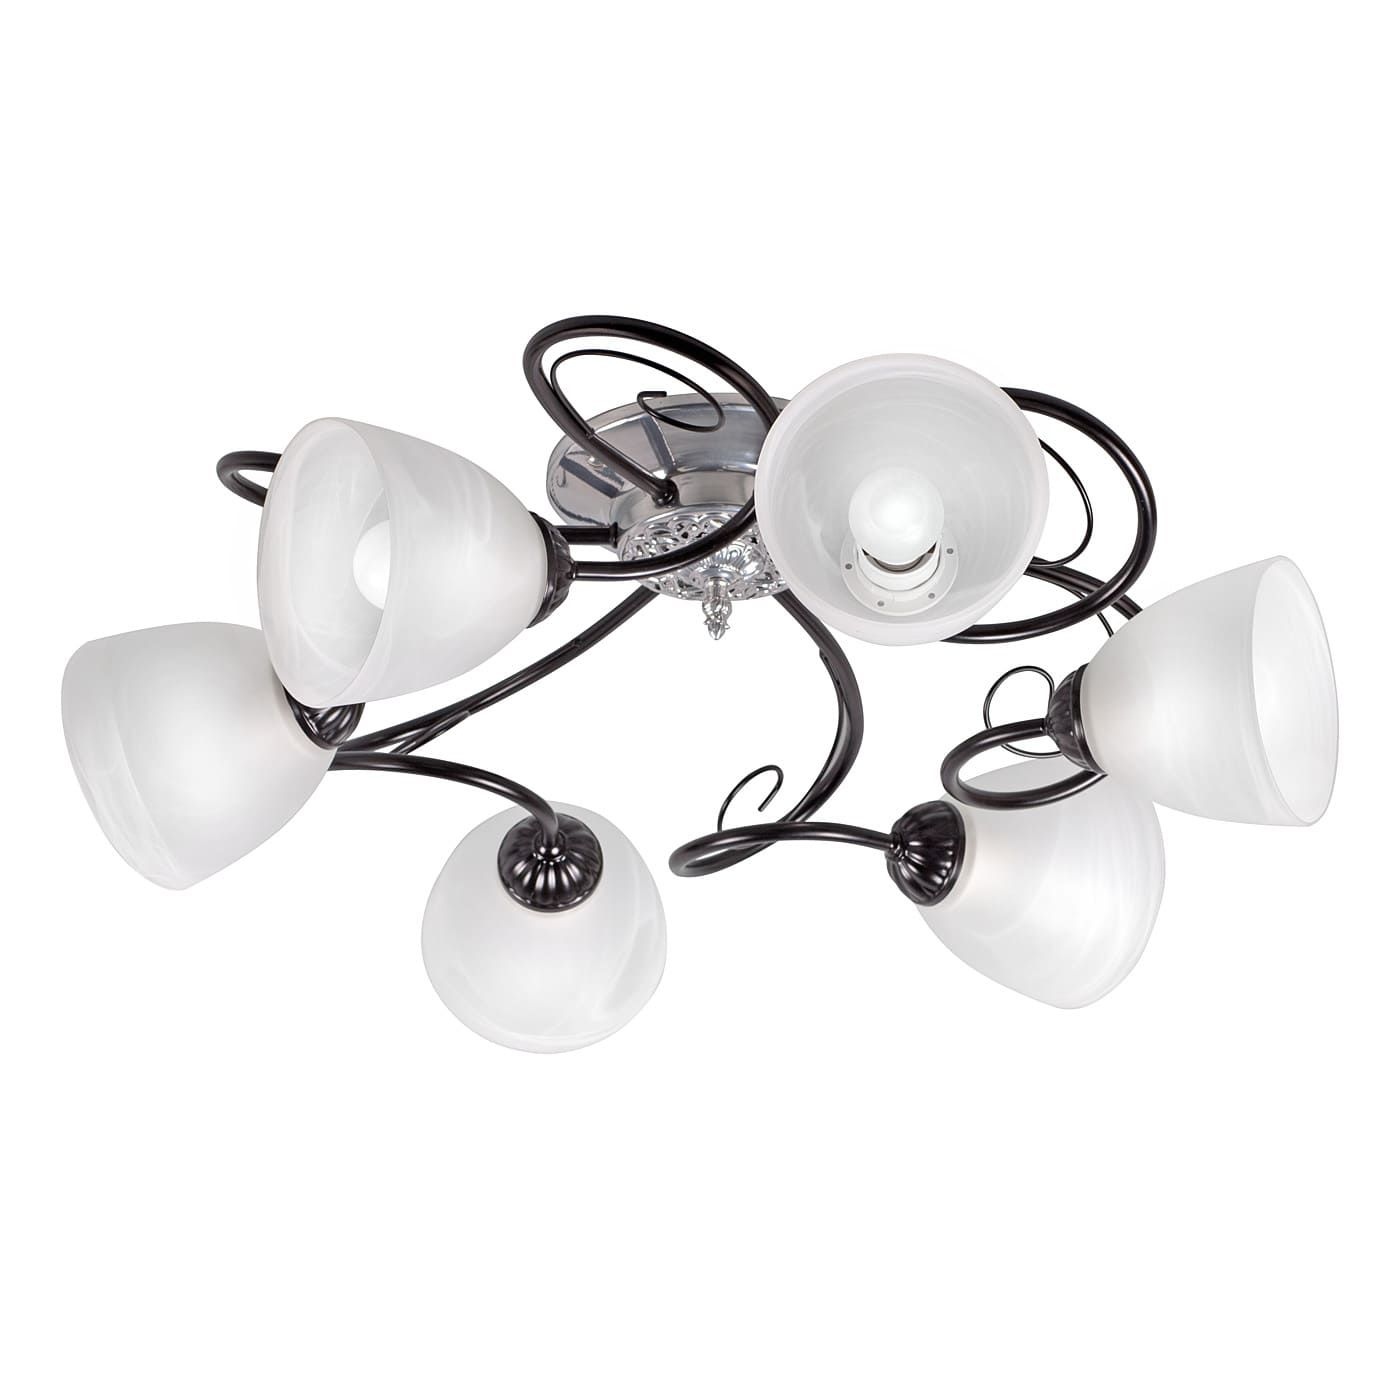 PETRASVET / Ceiling chandelier S2163-6, 6xE27 max. 60W